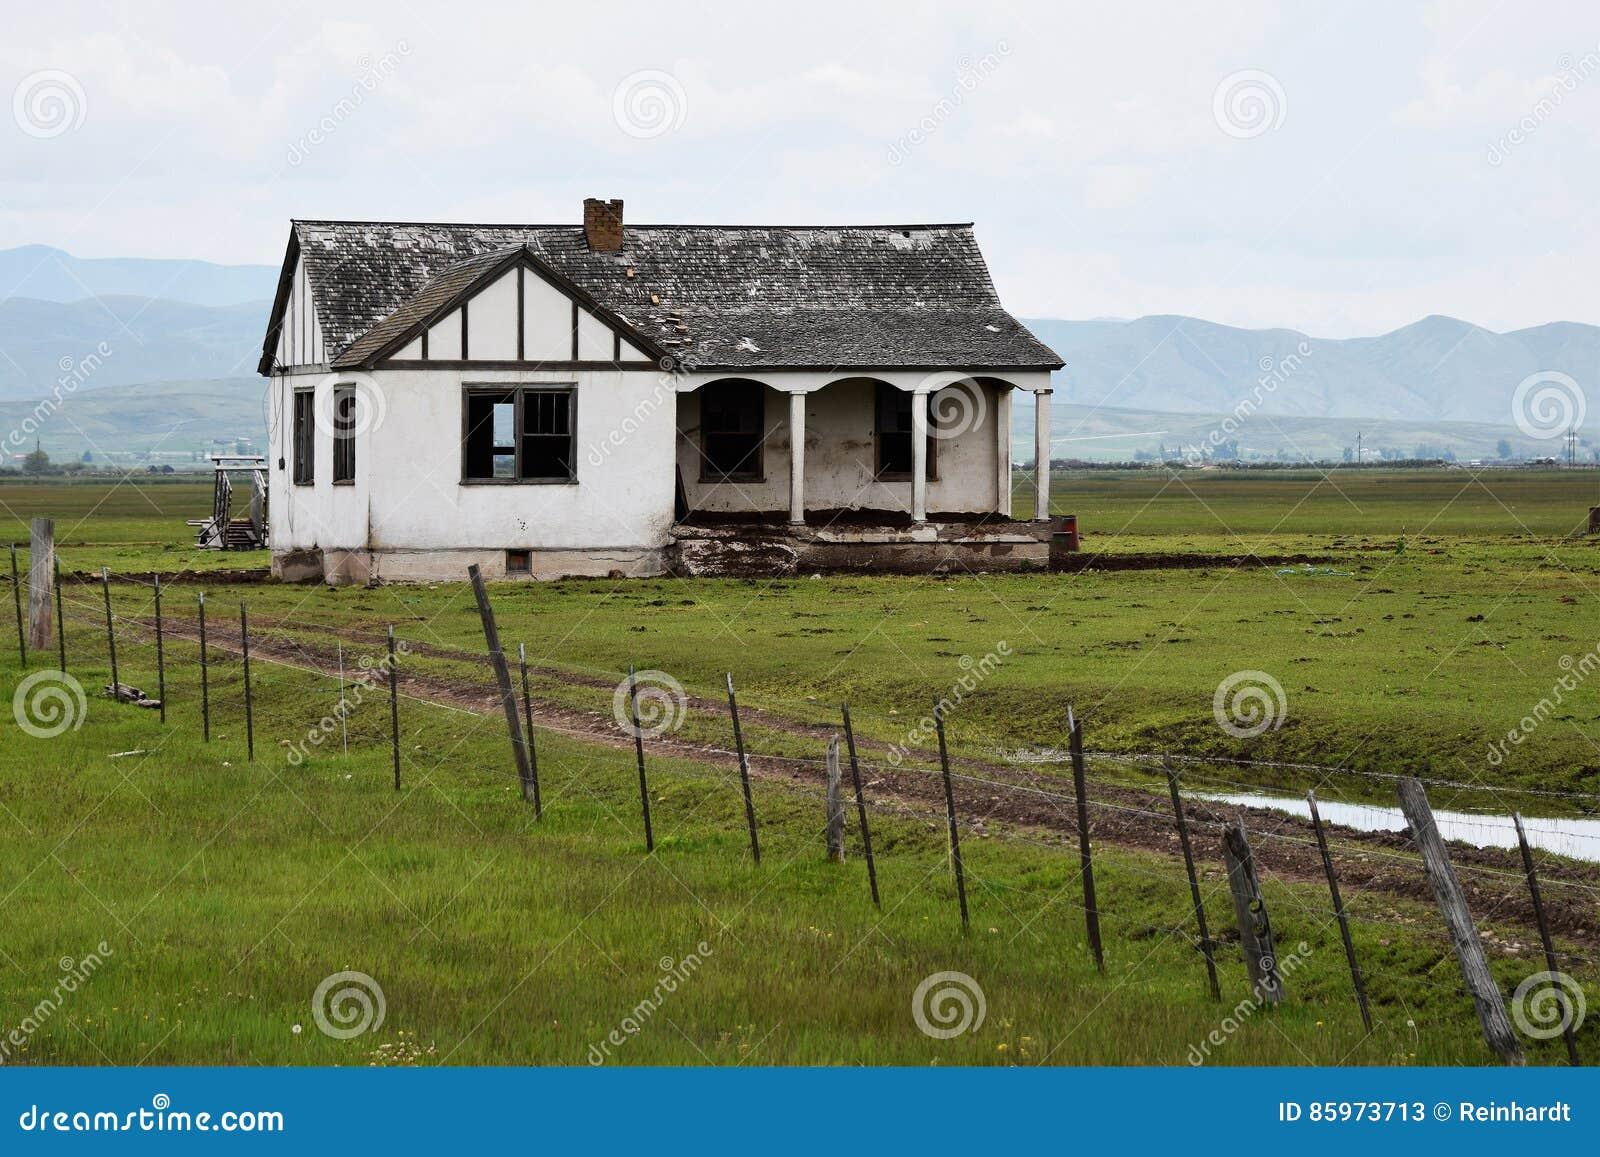 Download Oregon Trail, Idaho, Abandoned Homestead Stock Image - Image of weathered, oregon: 85973713